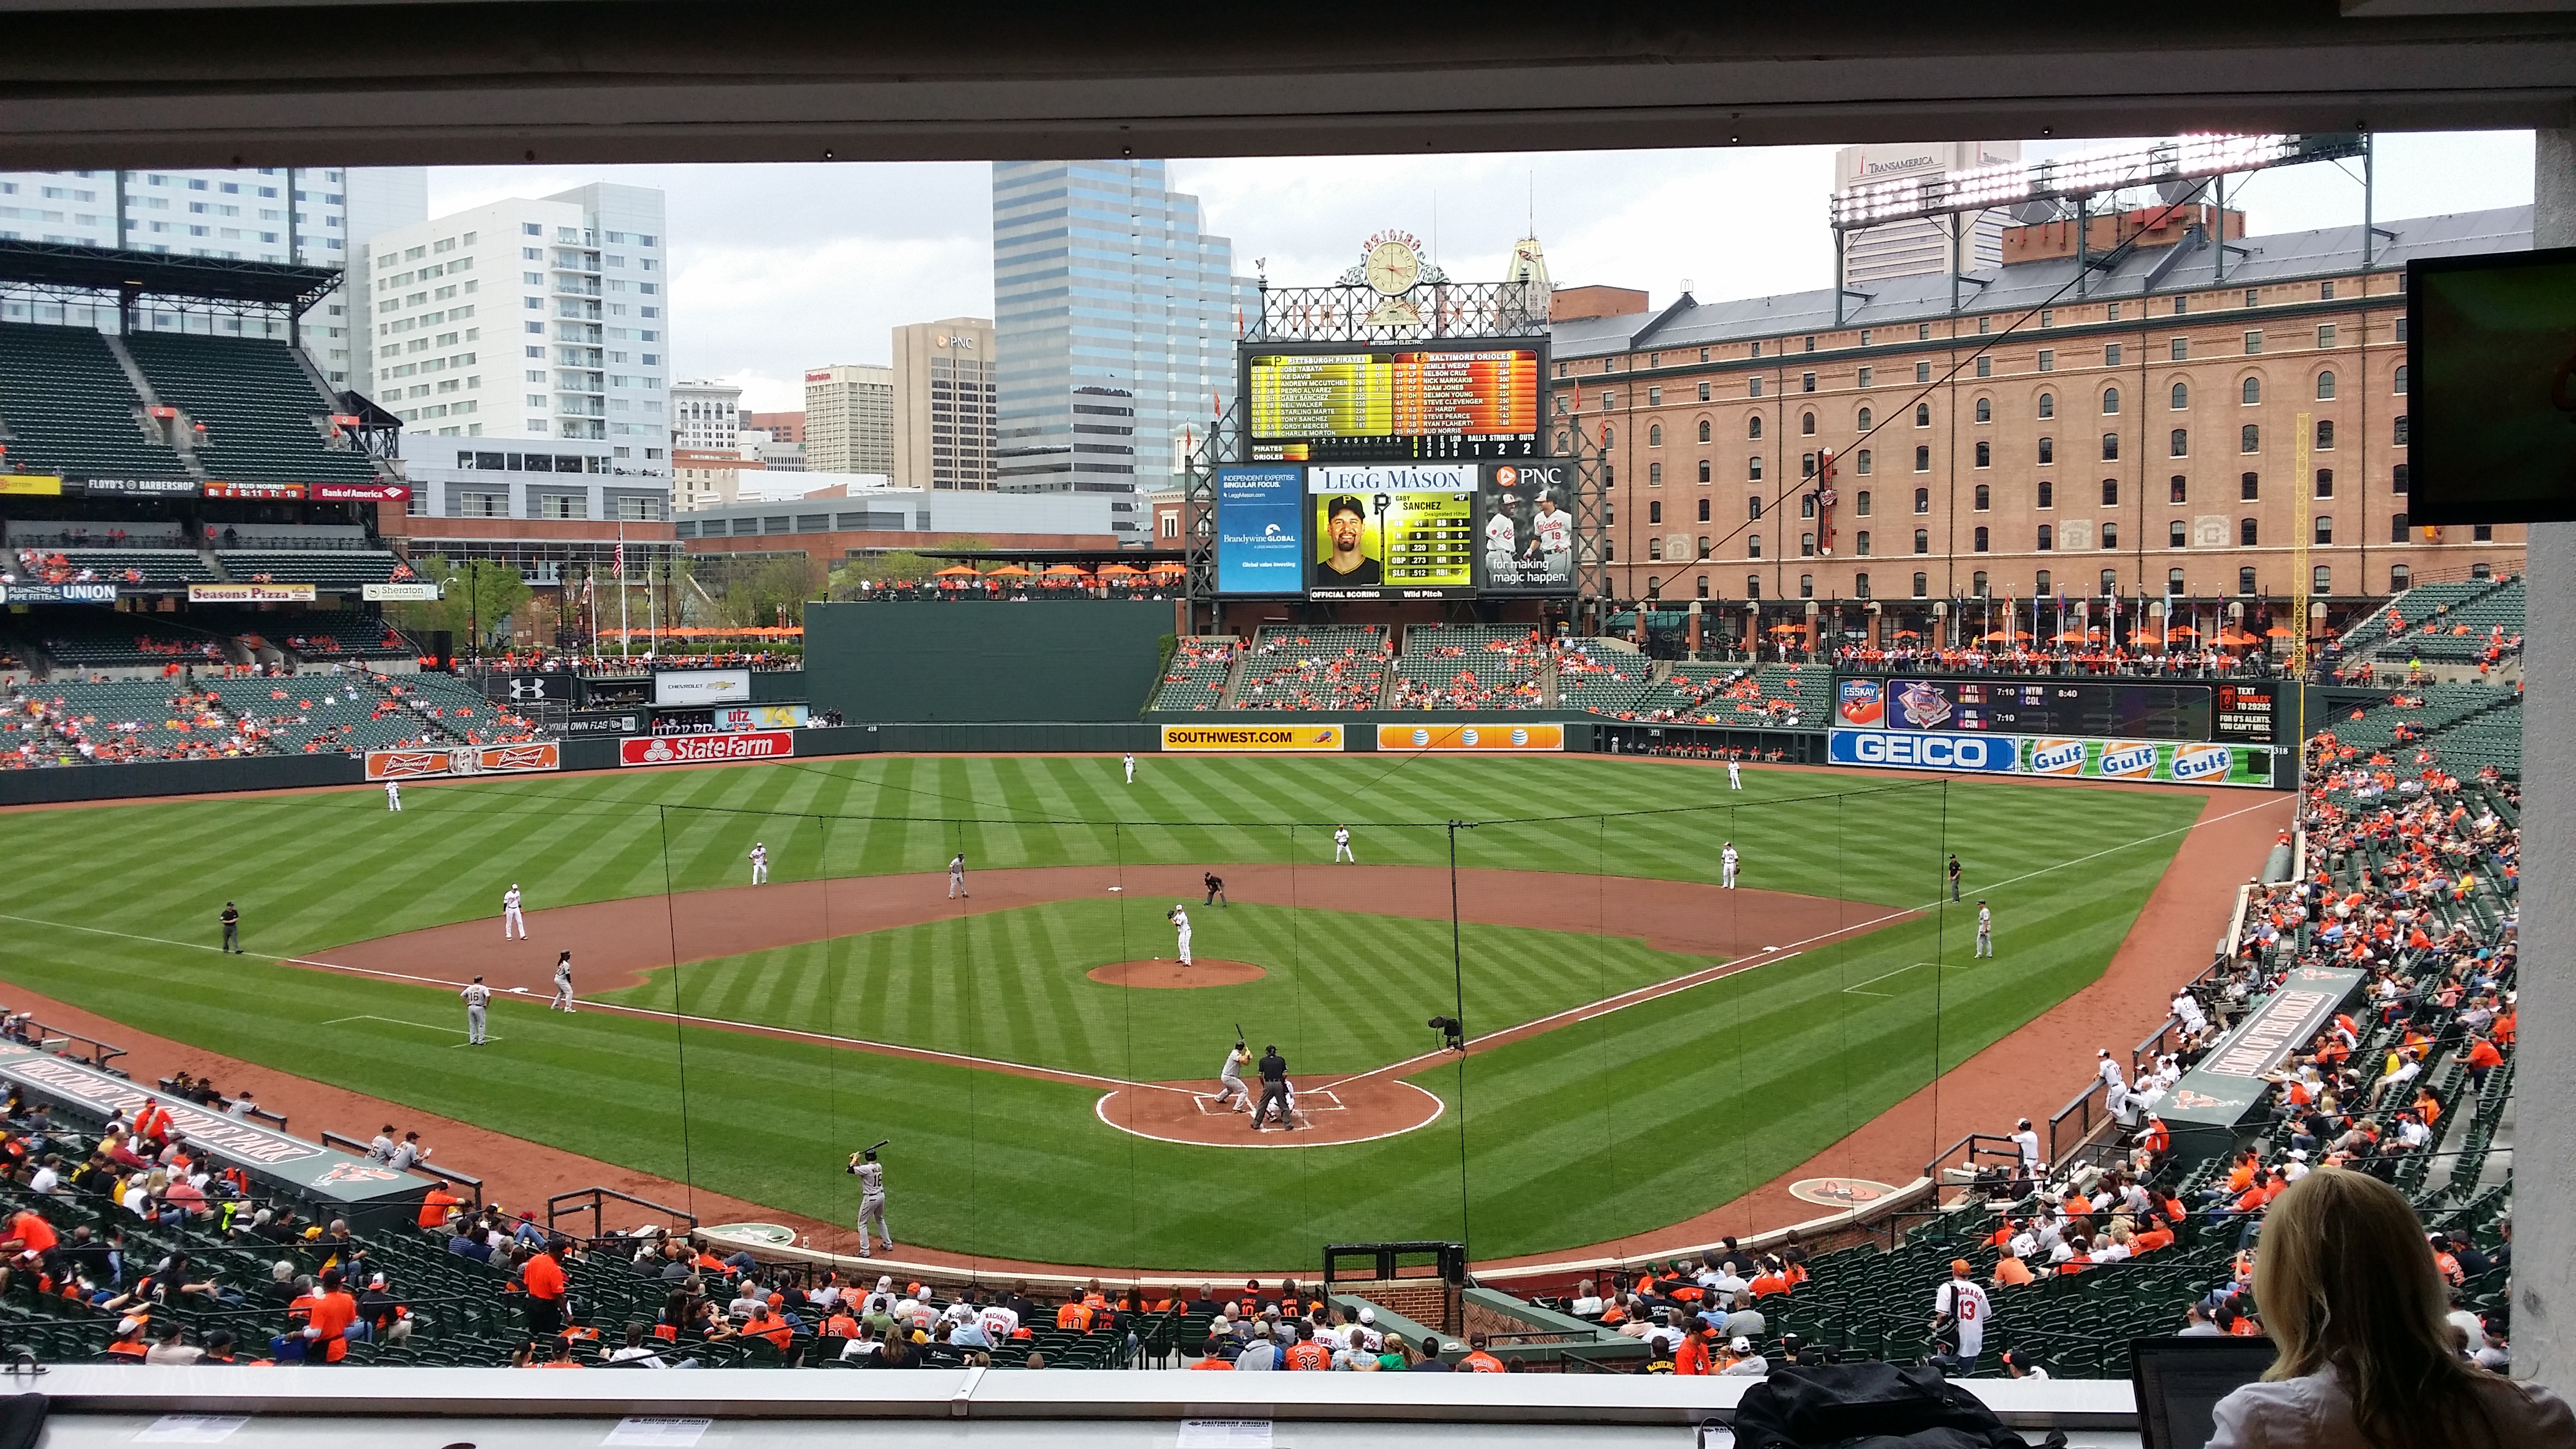 Orioles-Pirates games stir World Series memories